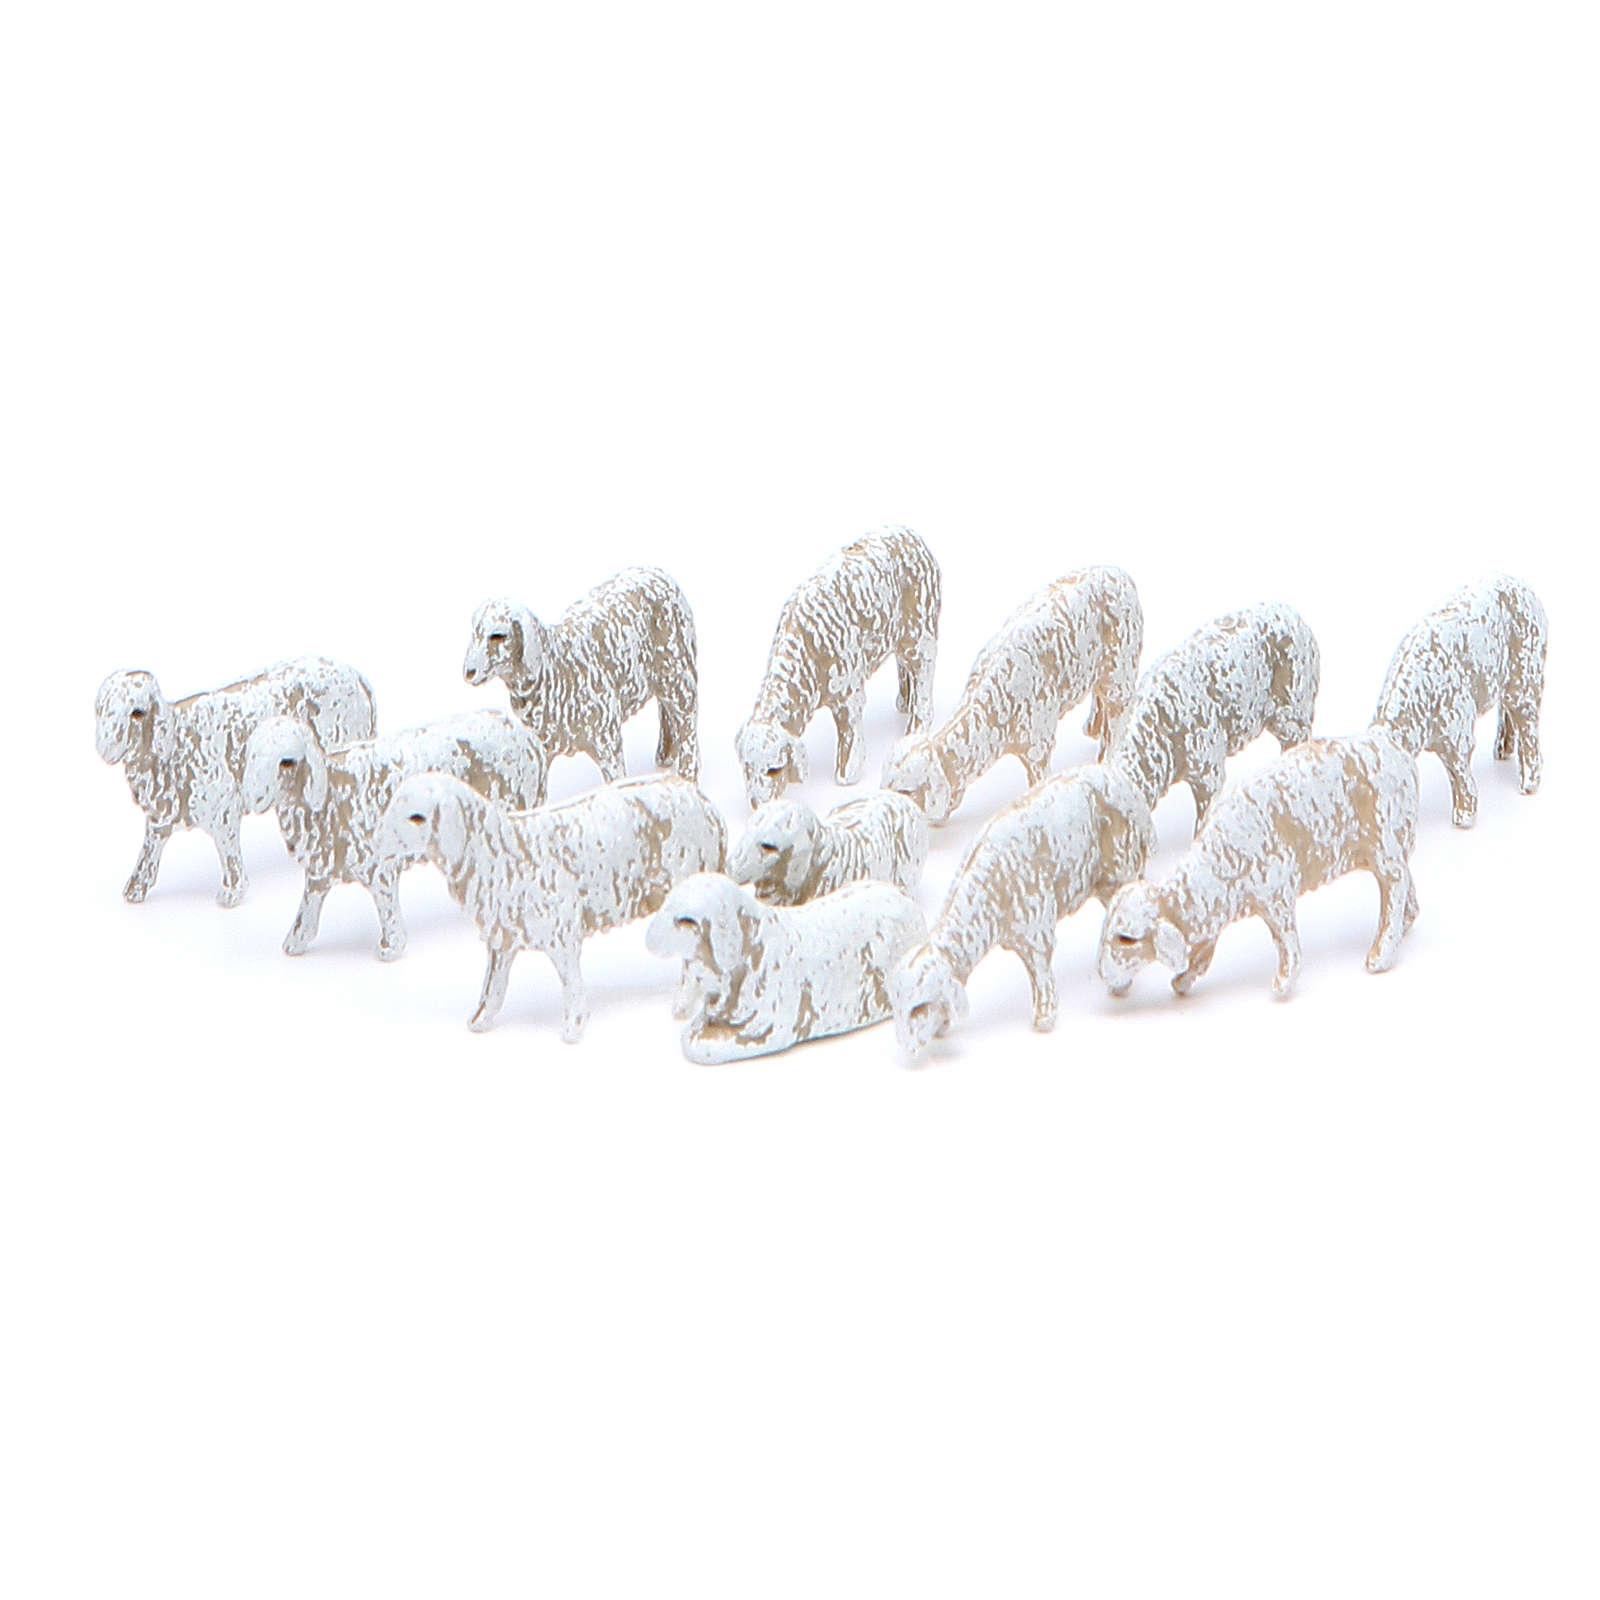 Sheep by Moranduzzo for 6cm nativity scene, set of 12 4